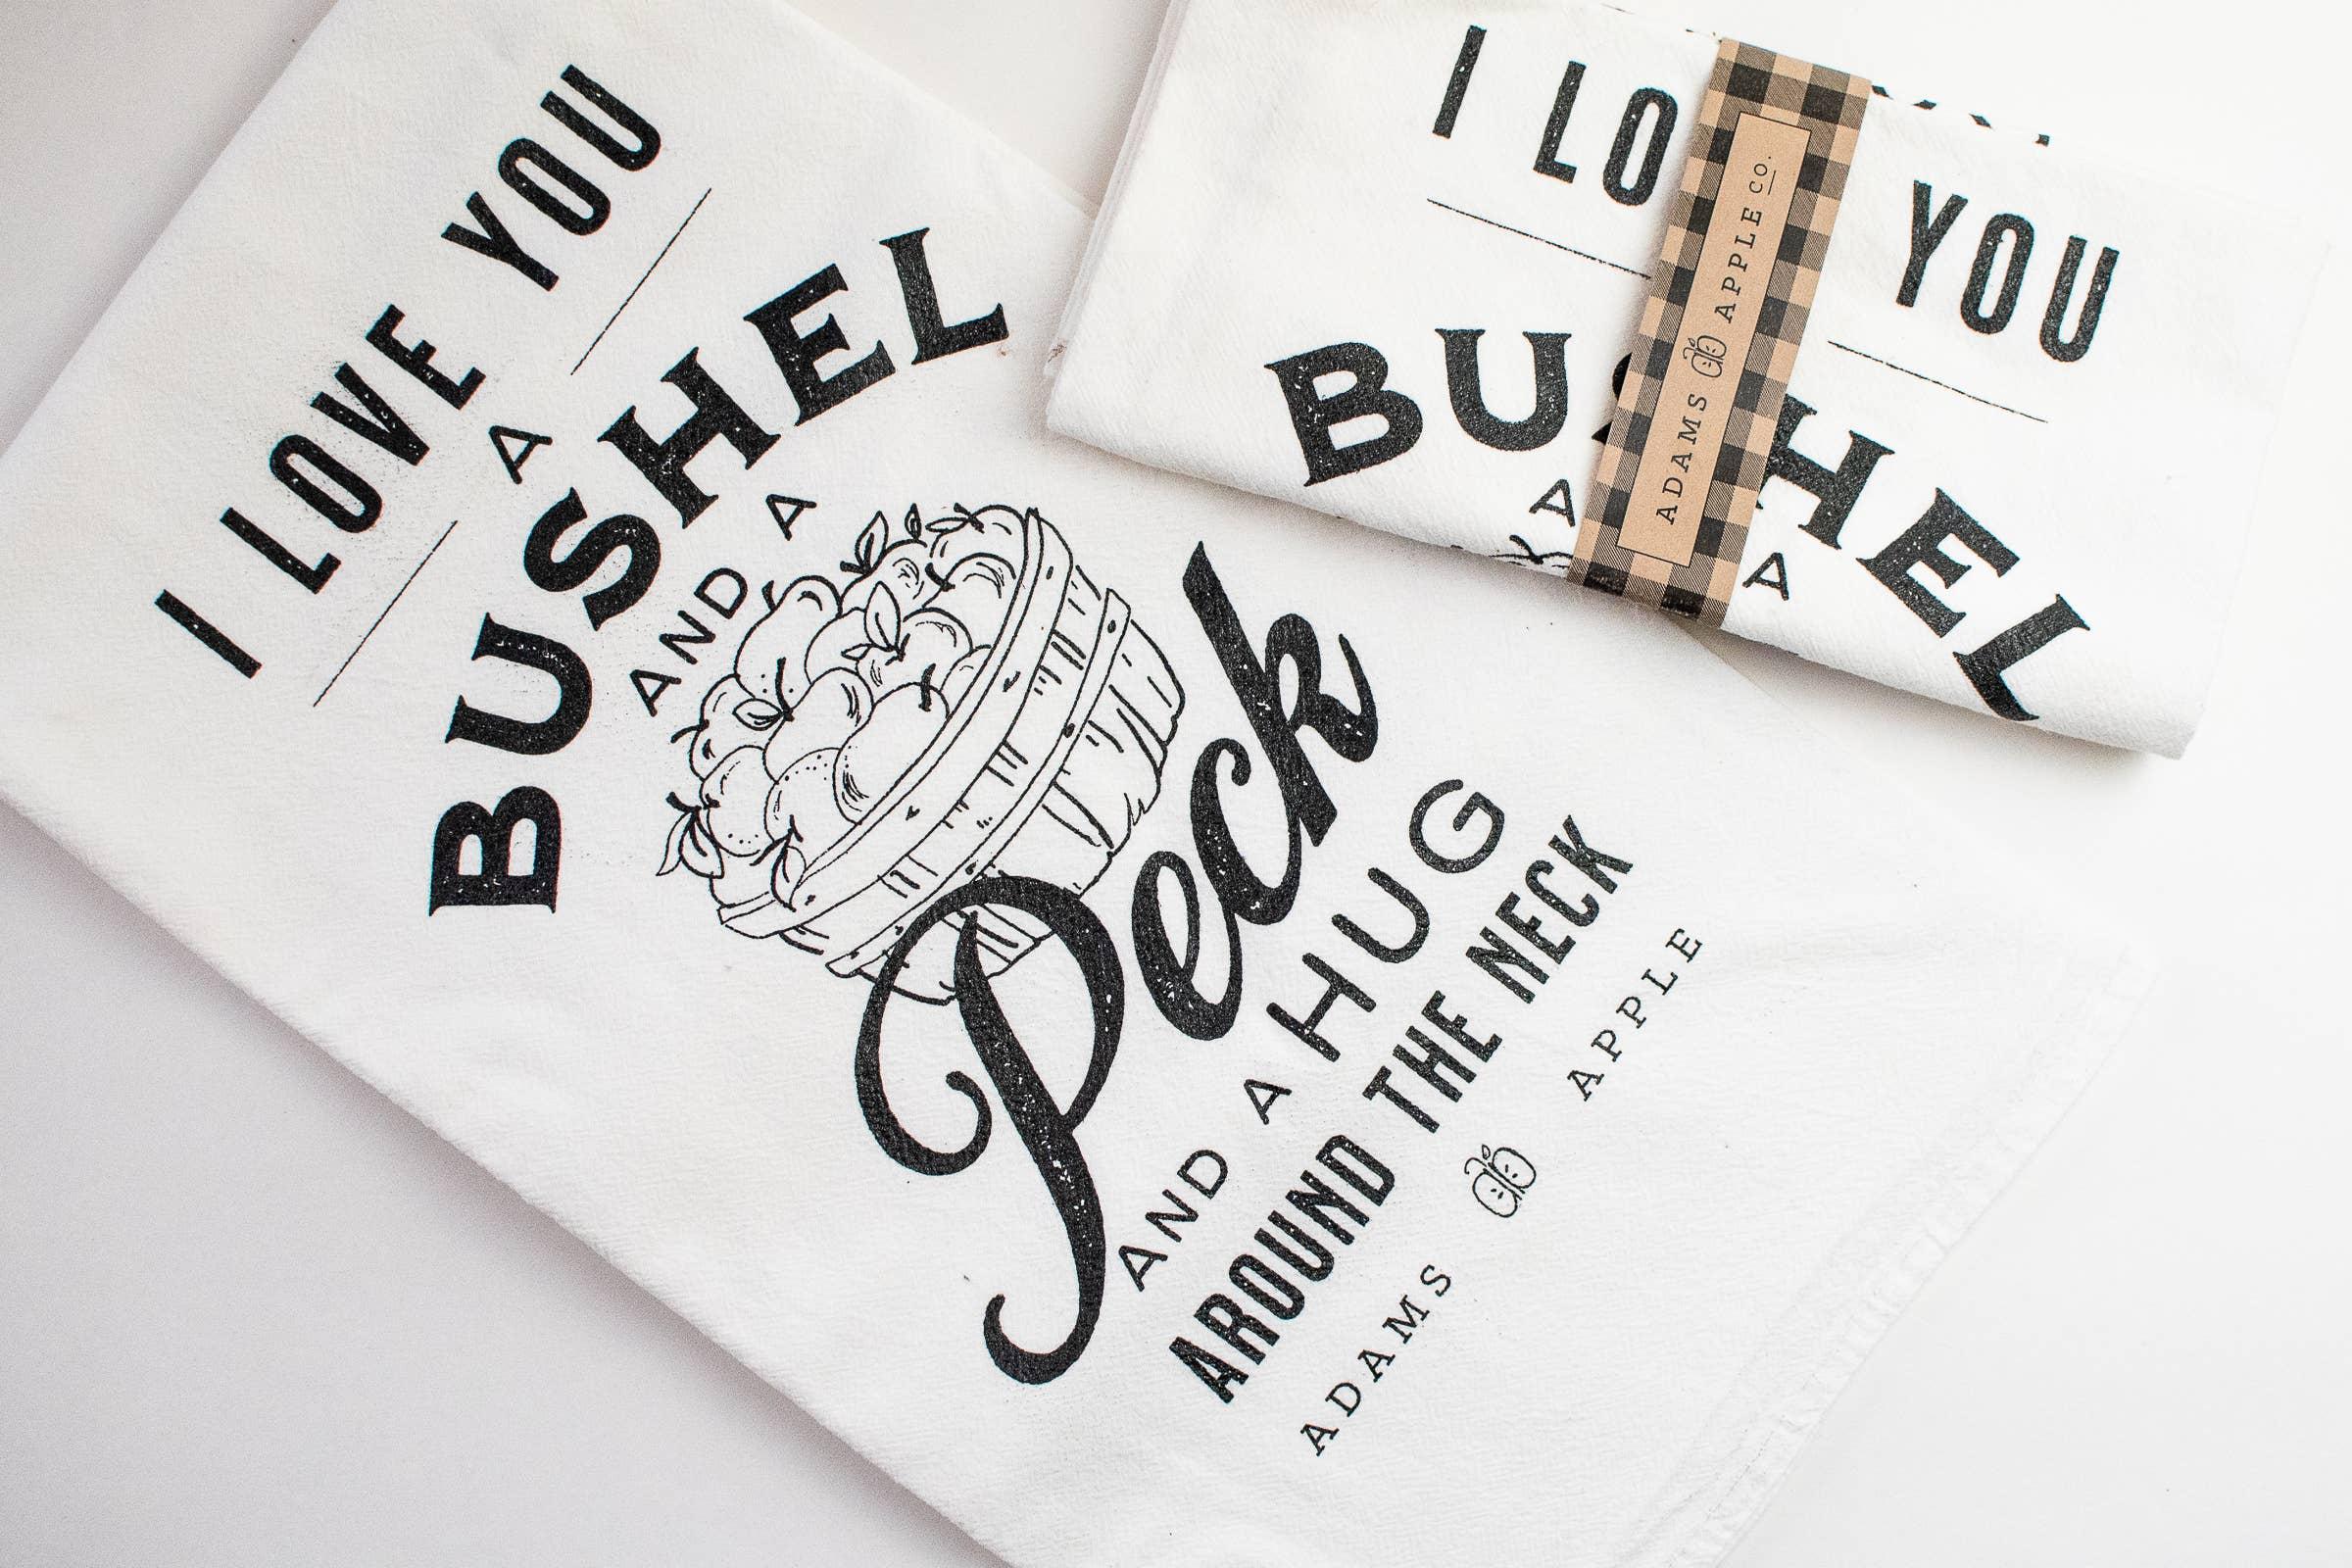 Bushel and a Peck Flour Sack Towel | Trada Marketplace